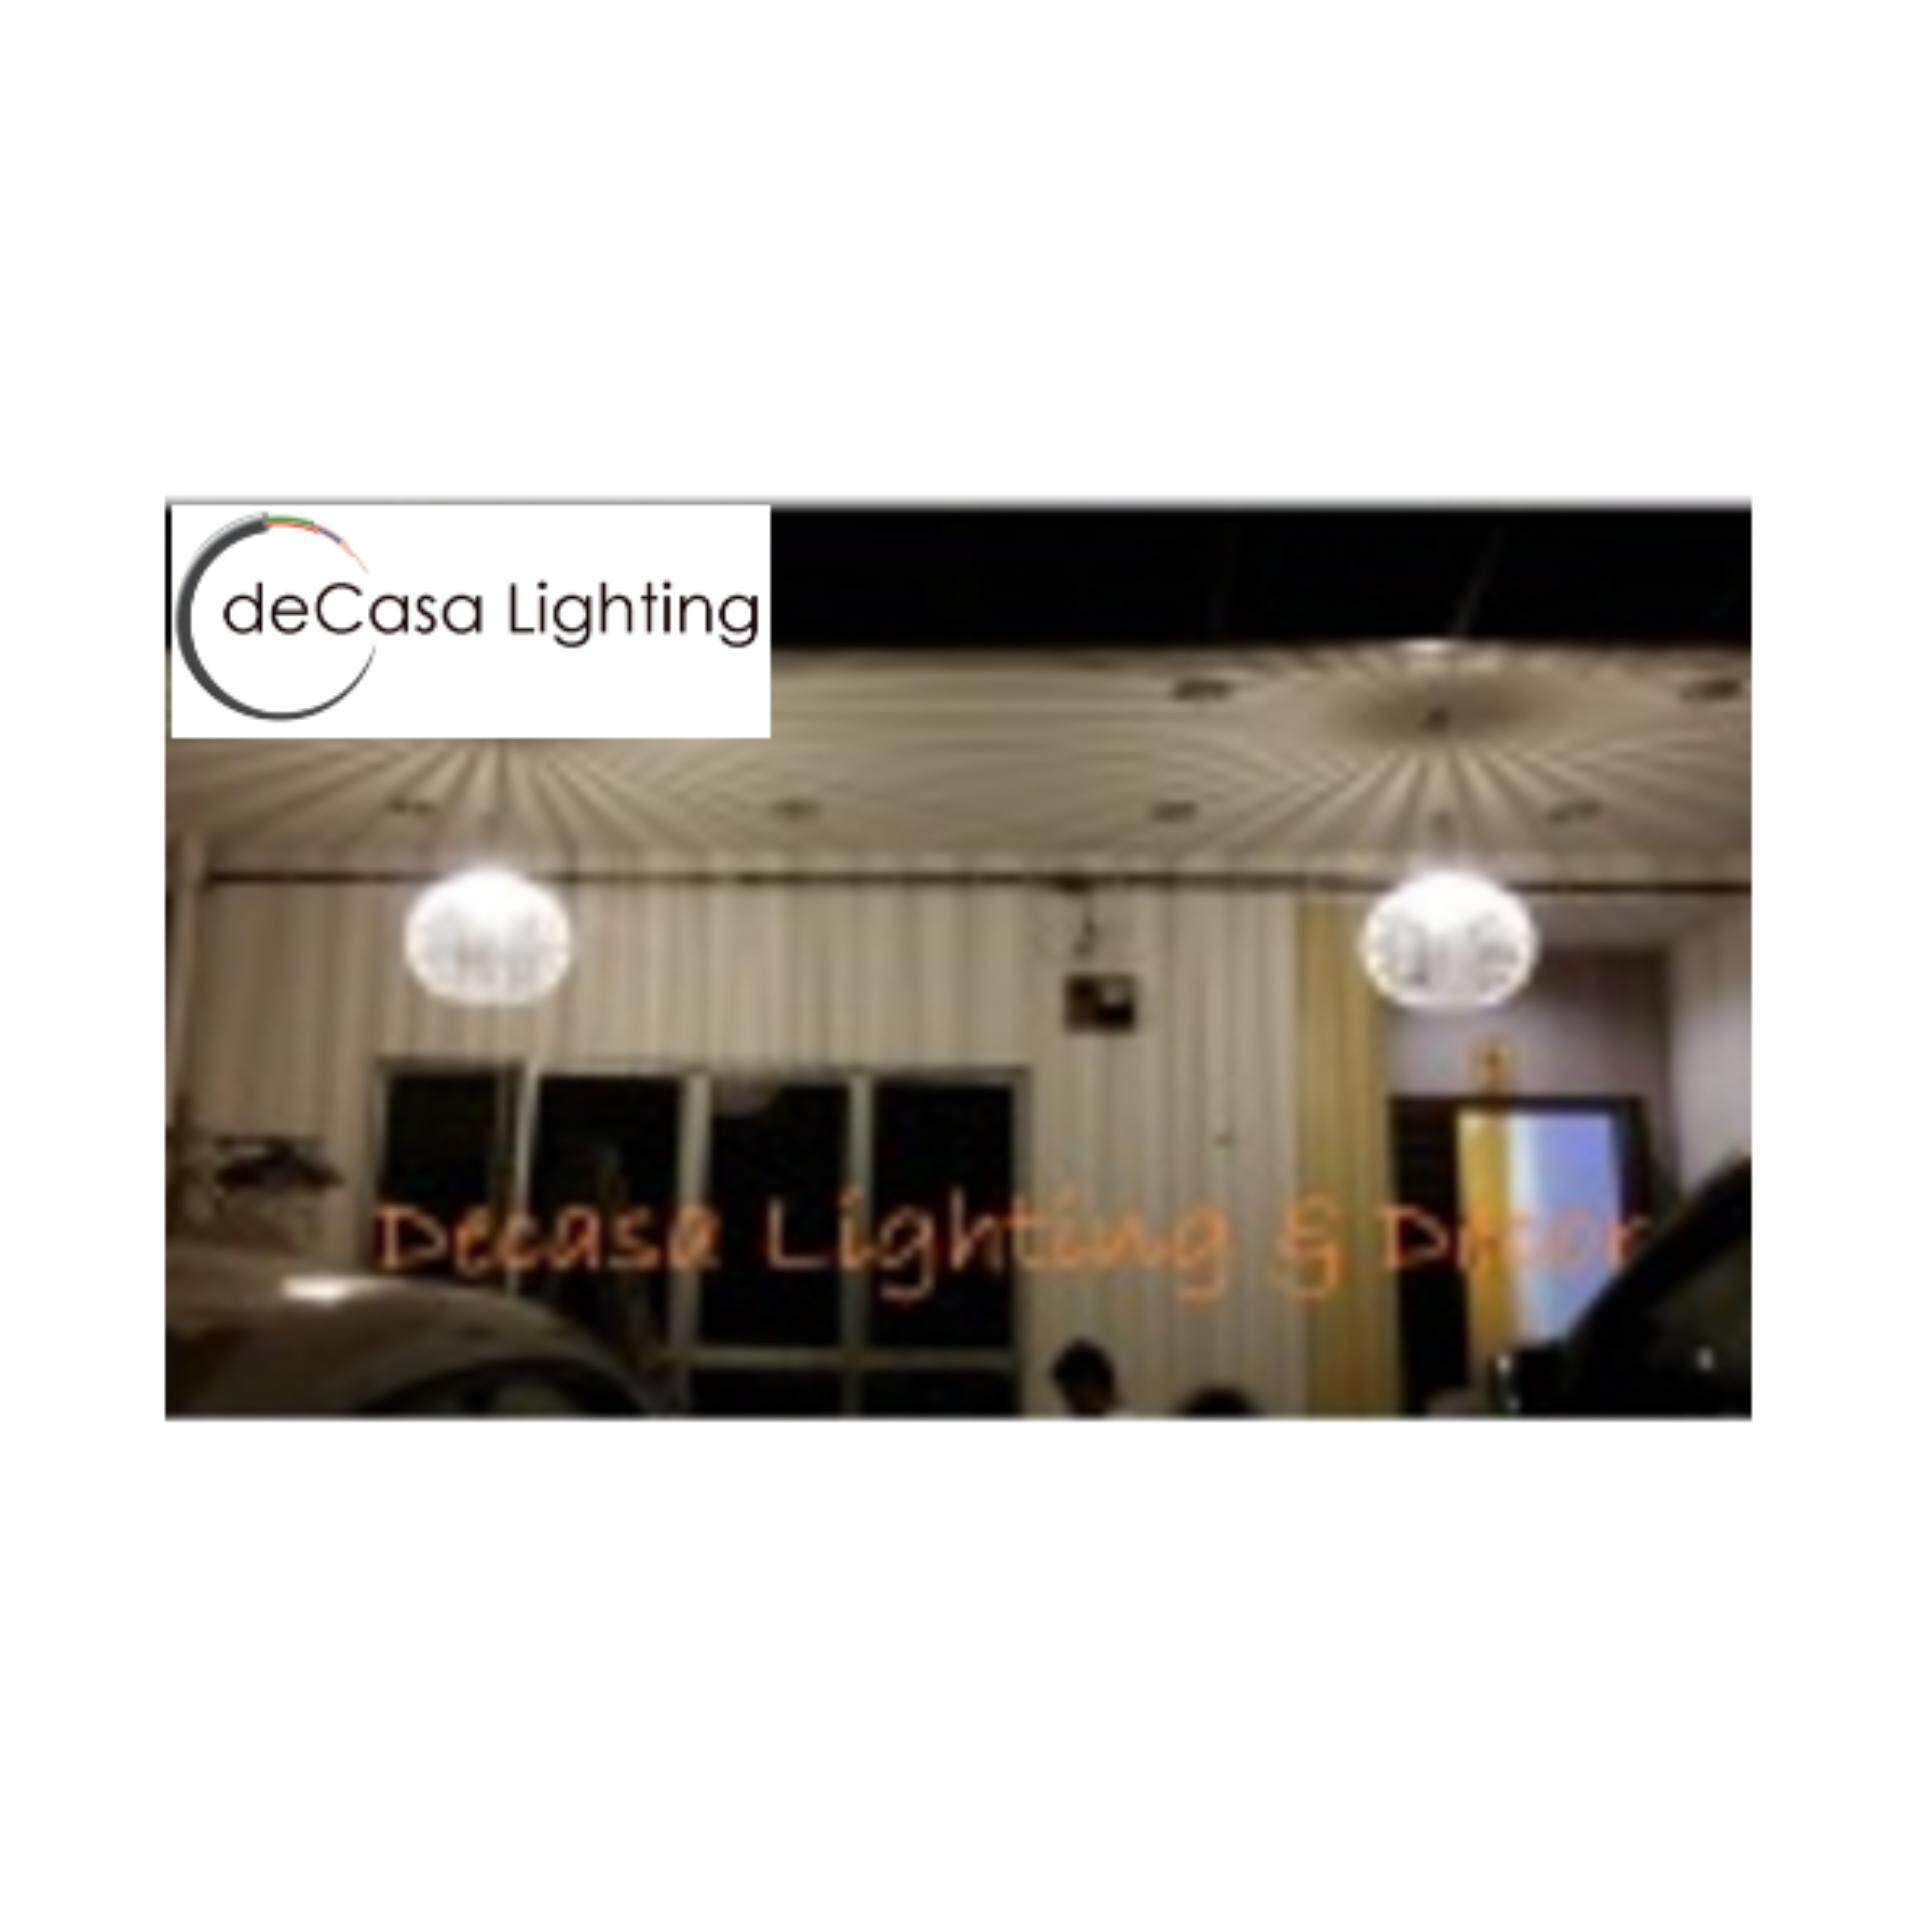 Attractive Ceiling Light Black Decorative Loft Light Pendant Light Special Light DECASA S-SIZE (Black) (JL-9006-230-BK)